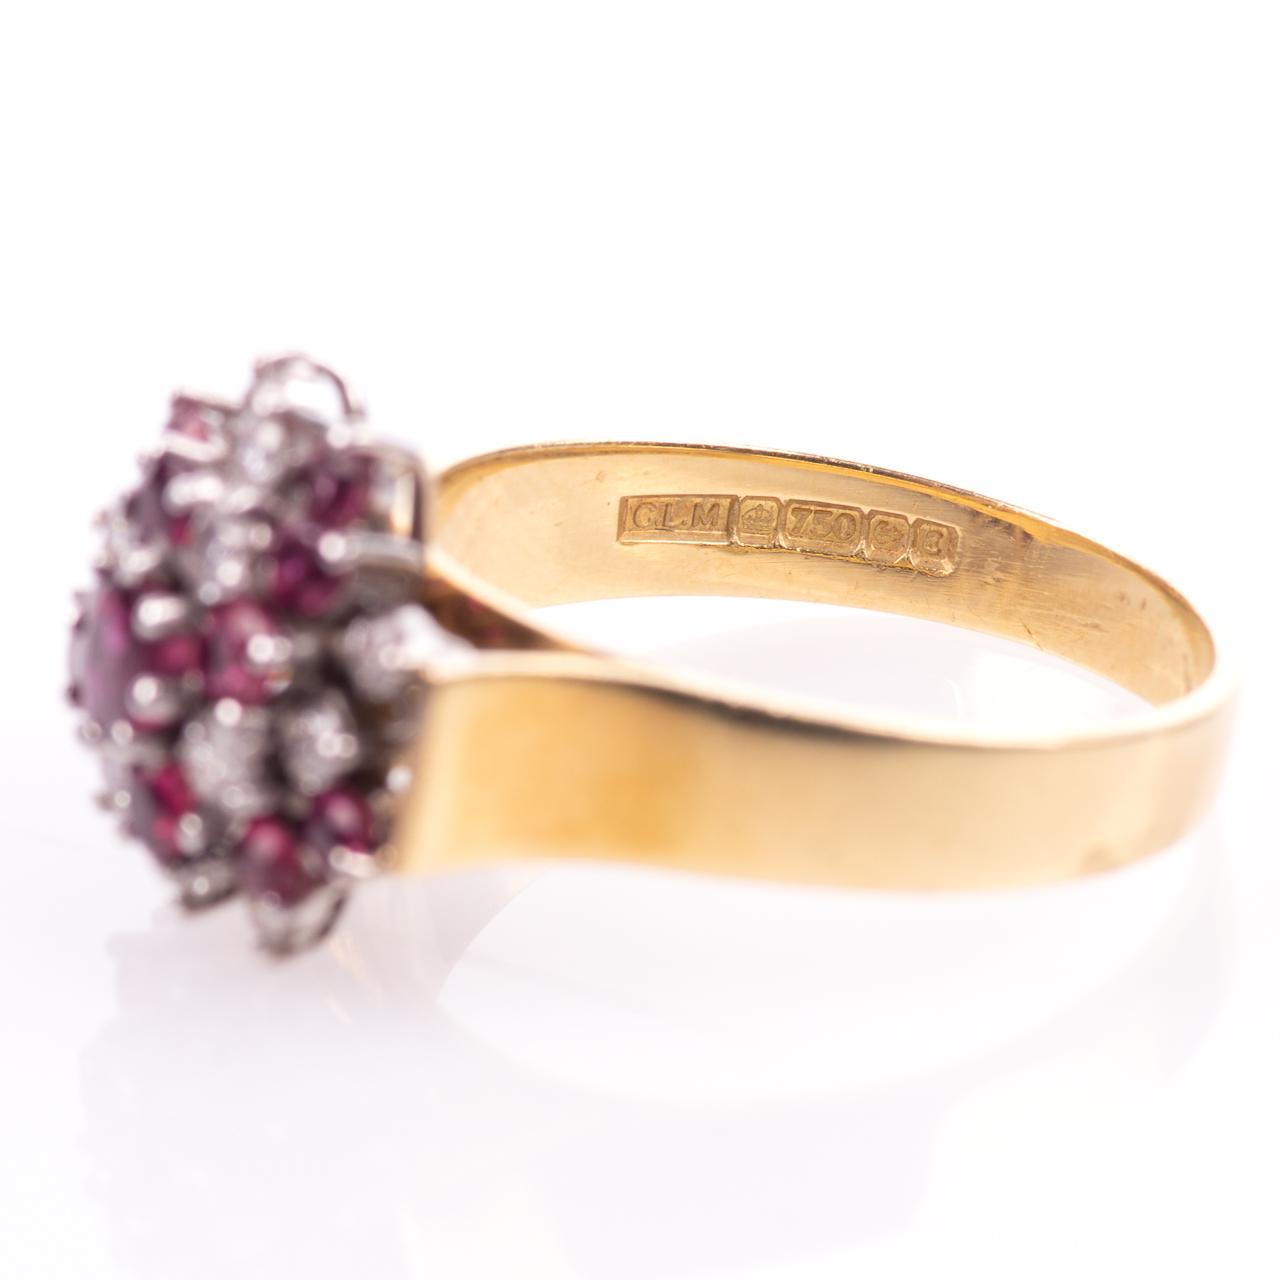 18ct Gold Ruby & 0.35ct Diamond Cluster Ring Hallmarked Birmingham - Image 5 of 7